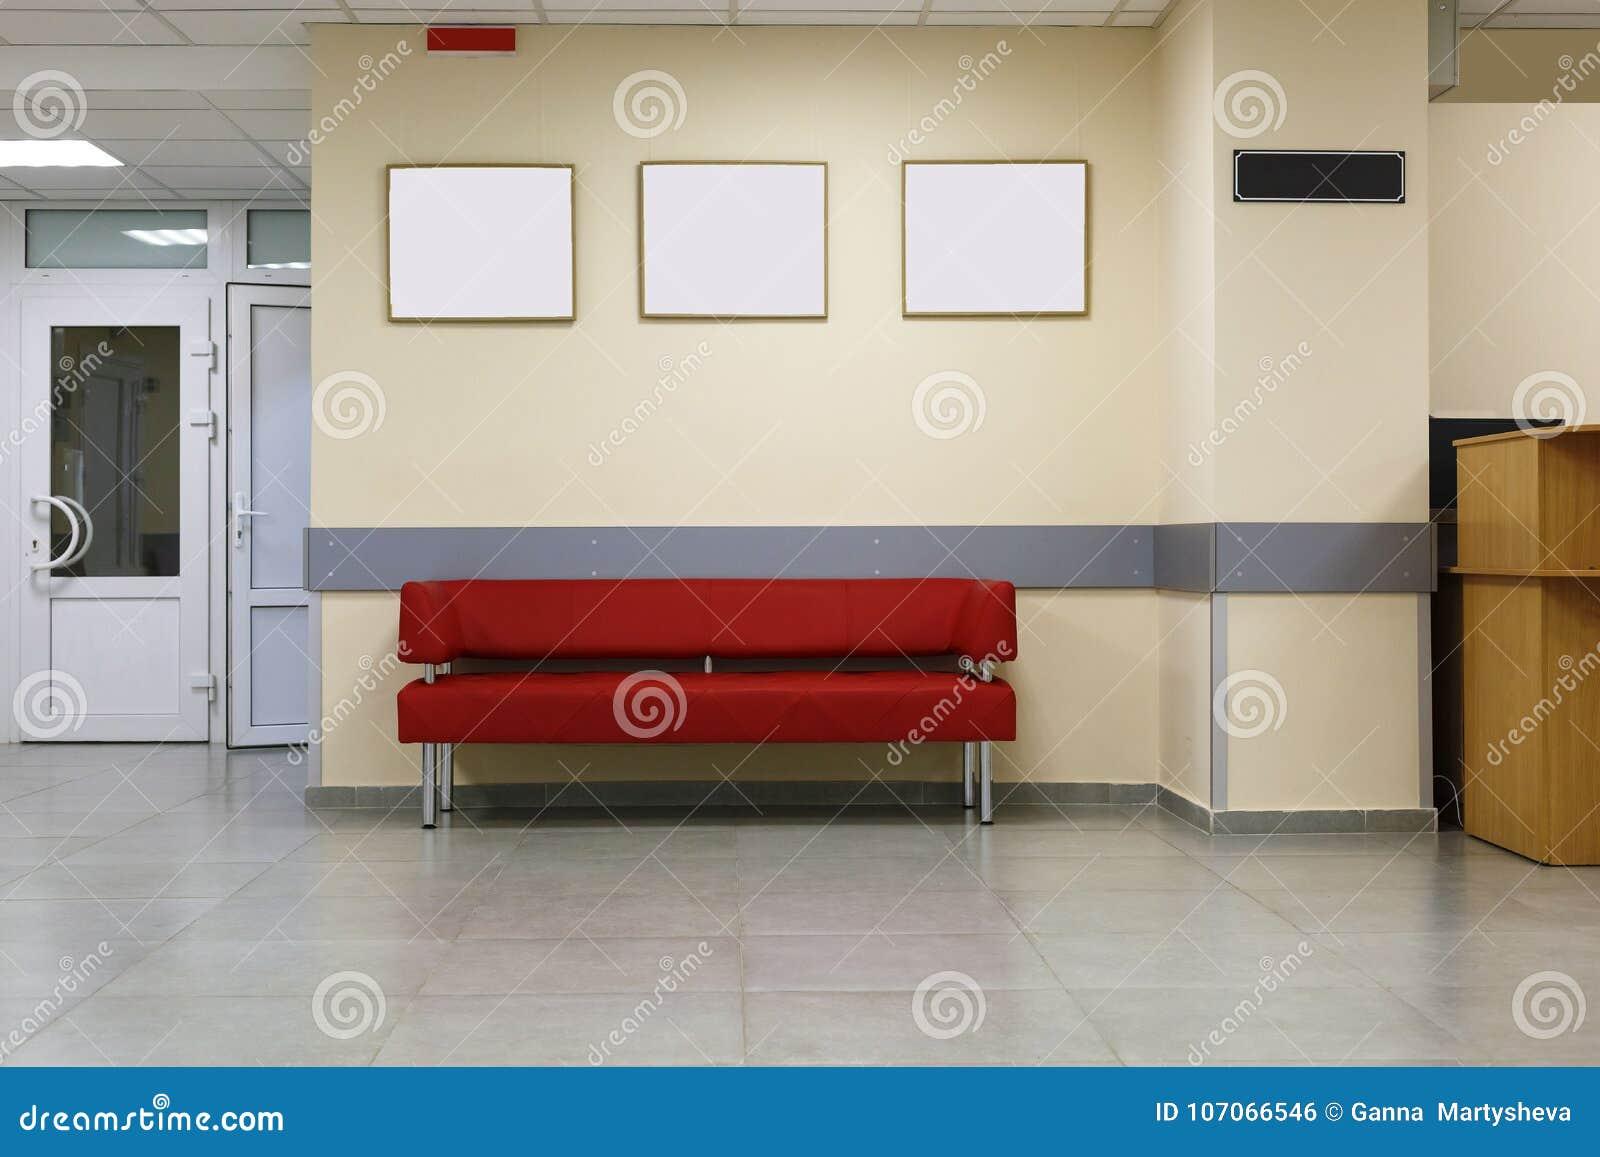 Surprising Style Minimalism Red Sofa Interior Design Office Empty Cjindustries Chair Design For Home Cjindustriesco